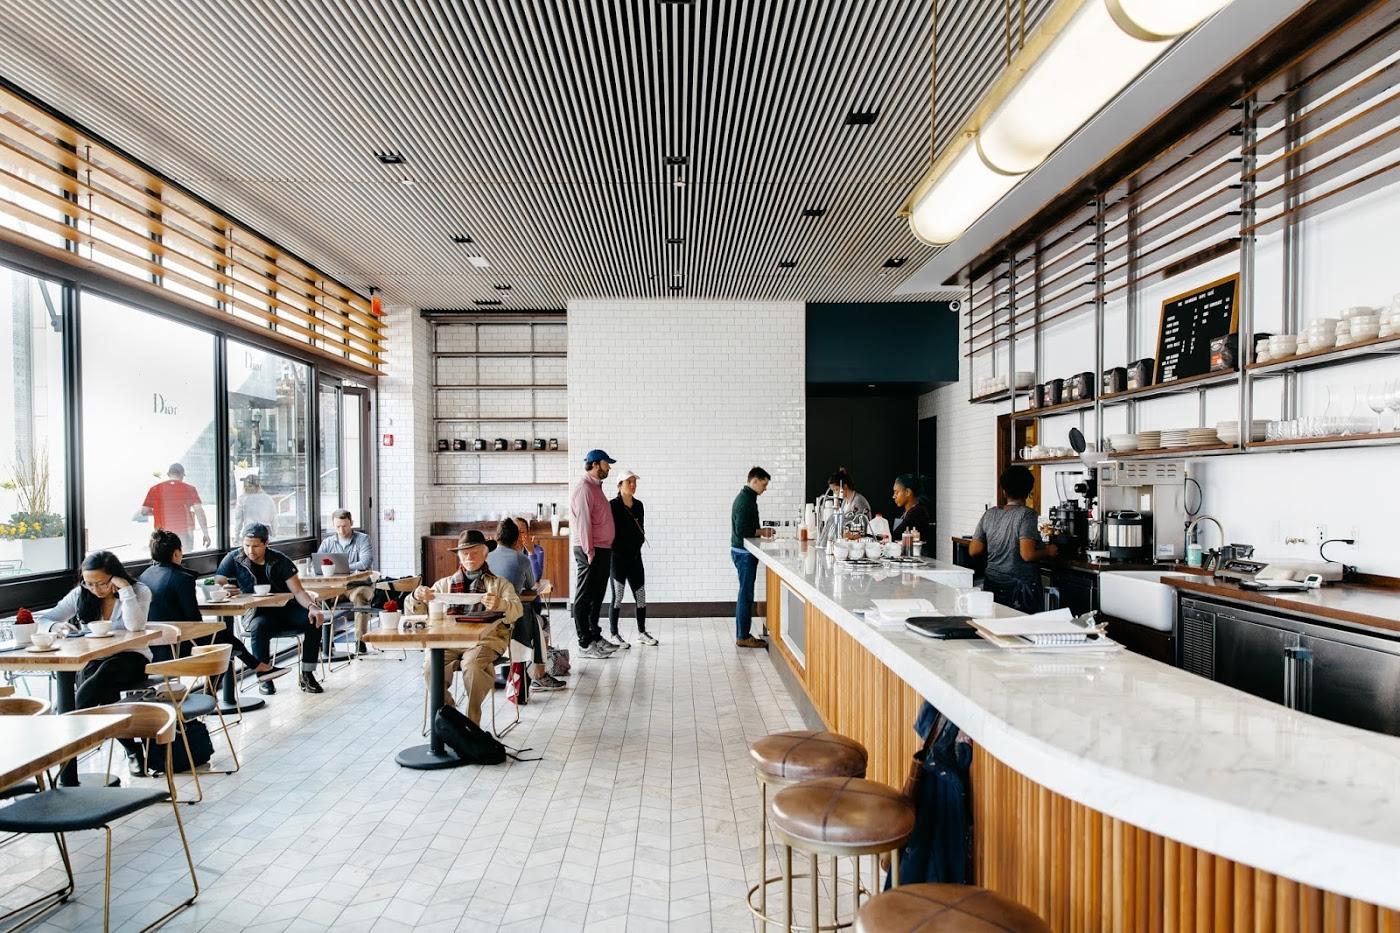 thiet-ke-quan-cafe-hien-dai-01-min